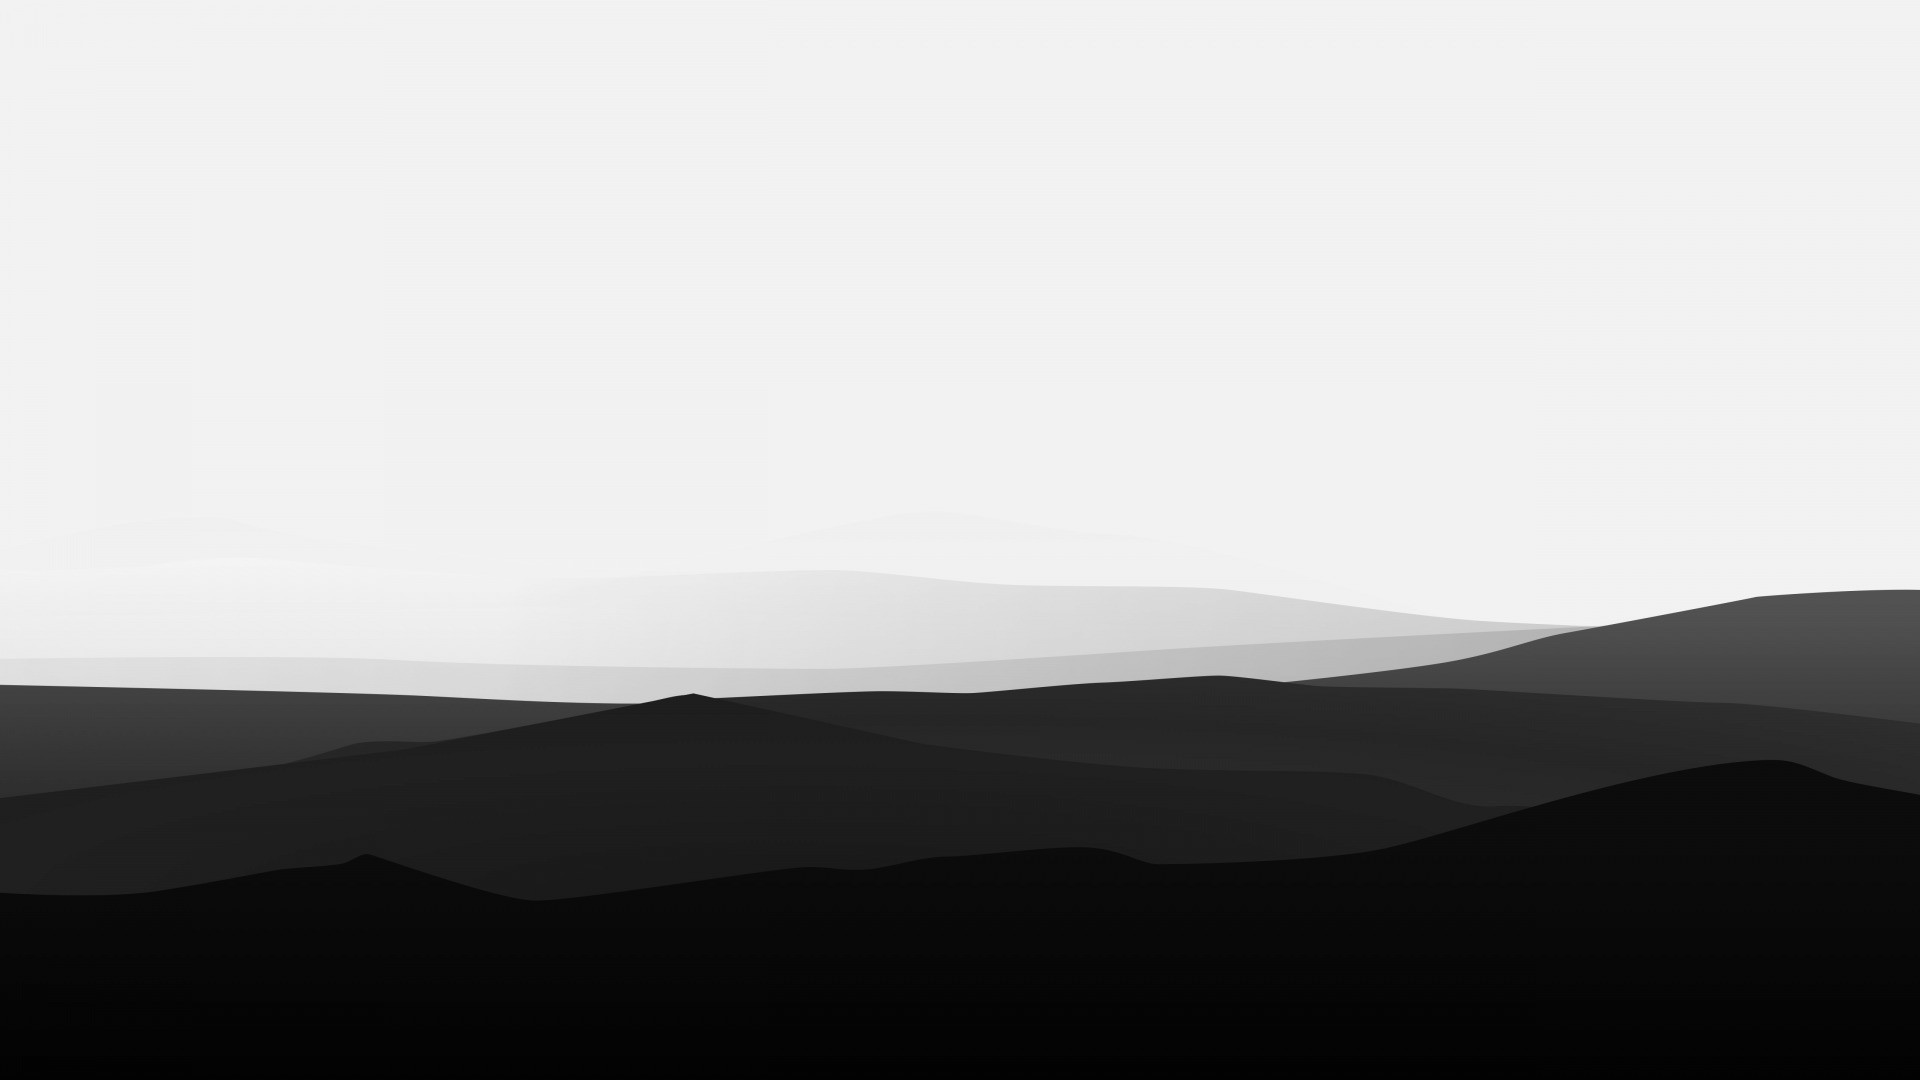 Minimalistic Stripes background wallpaper